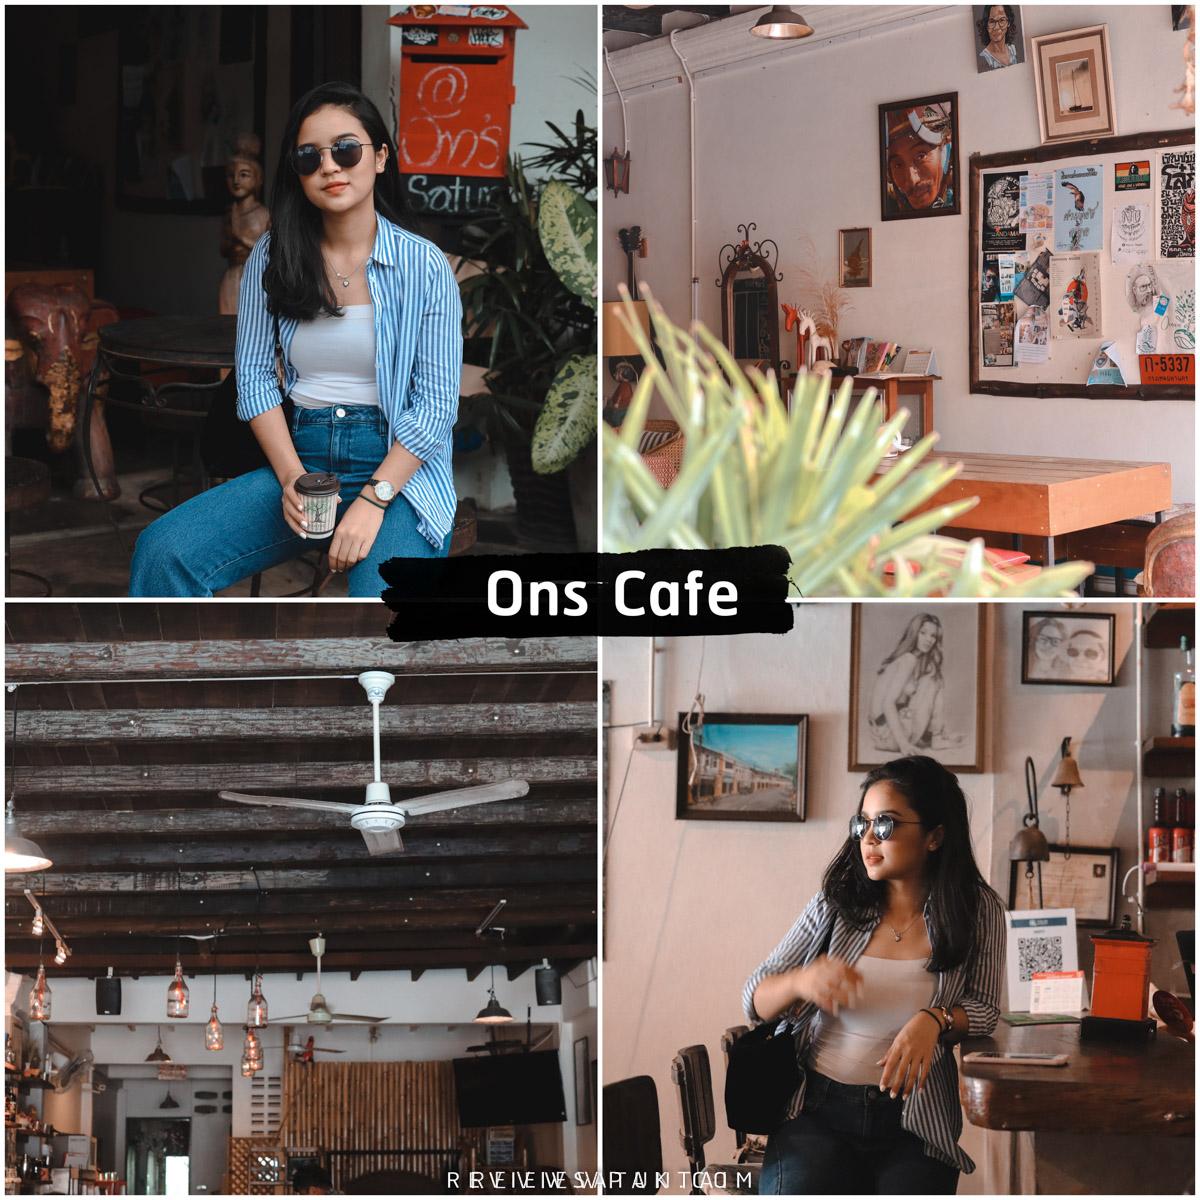 Ons Cafe คาเฟ่ลับๆ ย่านเมืองเก่าสตูล บอกเลยว่าเด็ด จุดเช็คอิน,หลีเป๊ะ,สตูลสดยกกำลังสาม,satunwonderland,เที่ยวเมืองไทยAmazingกว่าเดิม,ชีพจรลงSouth